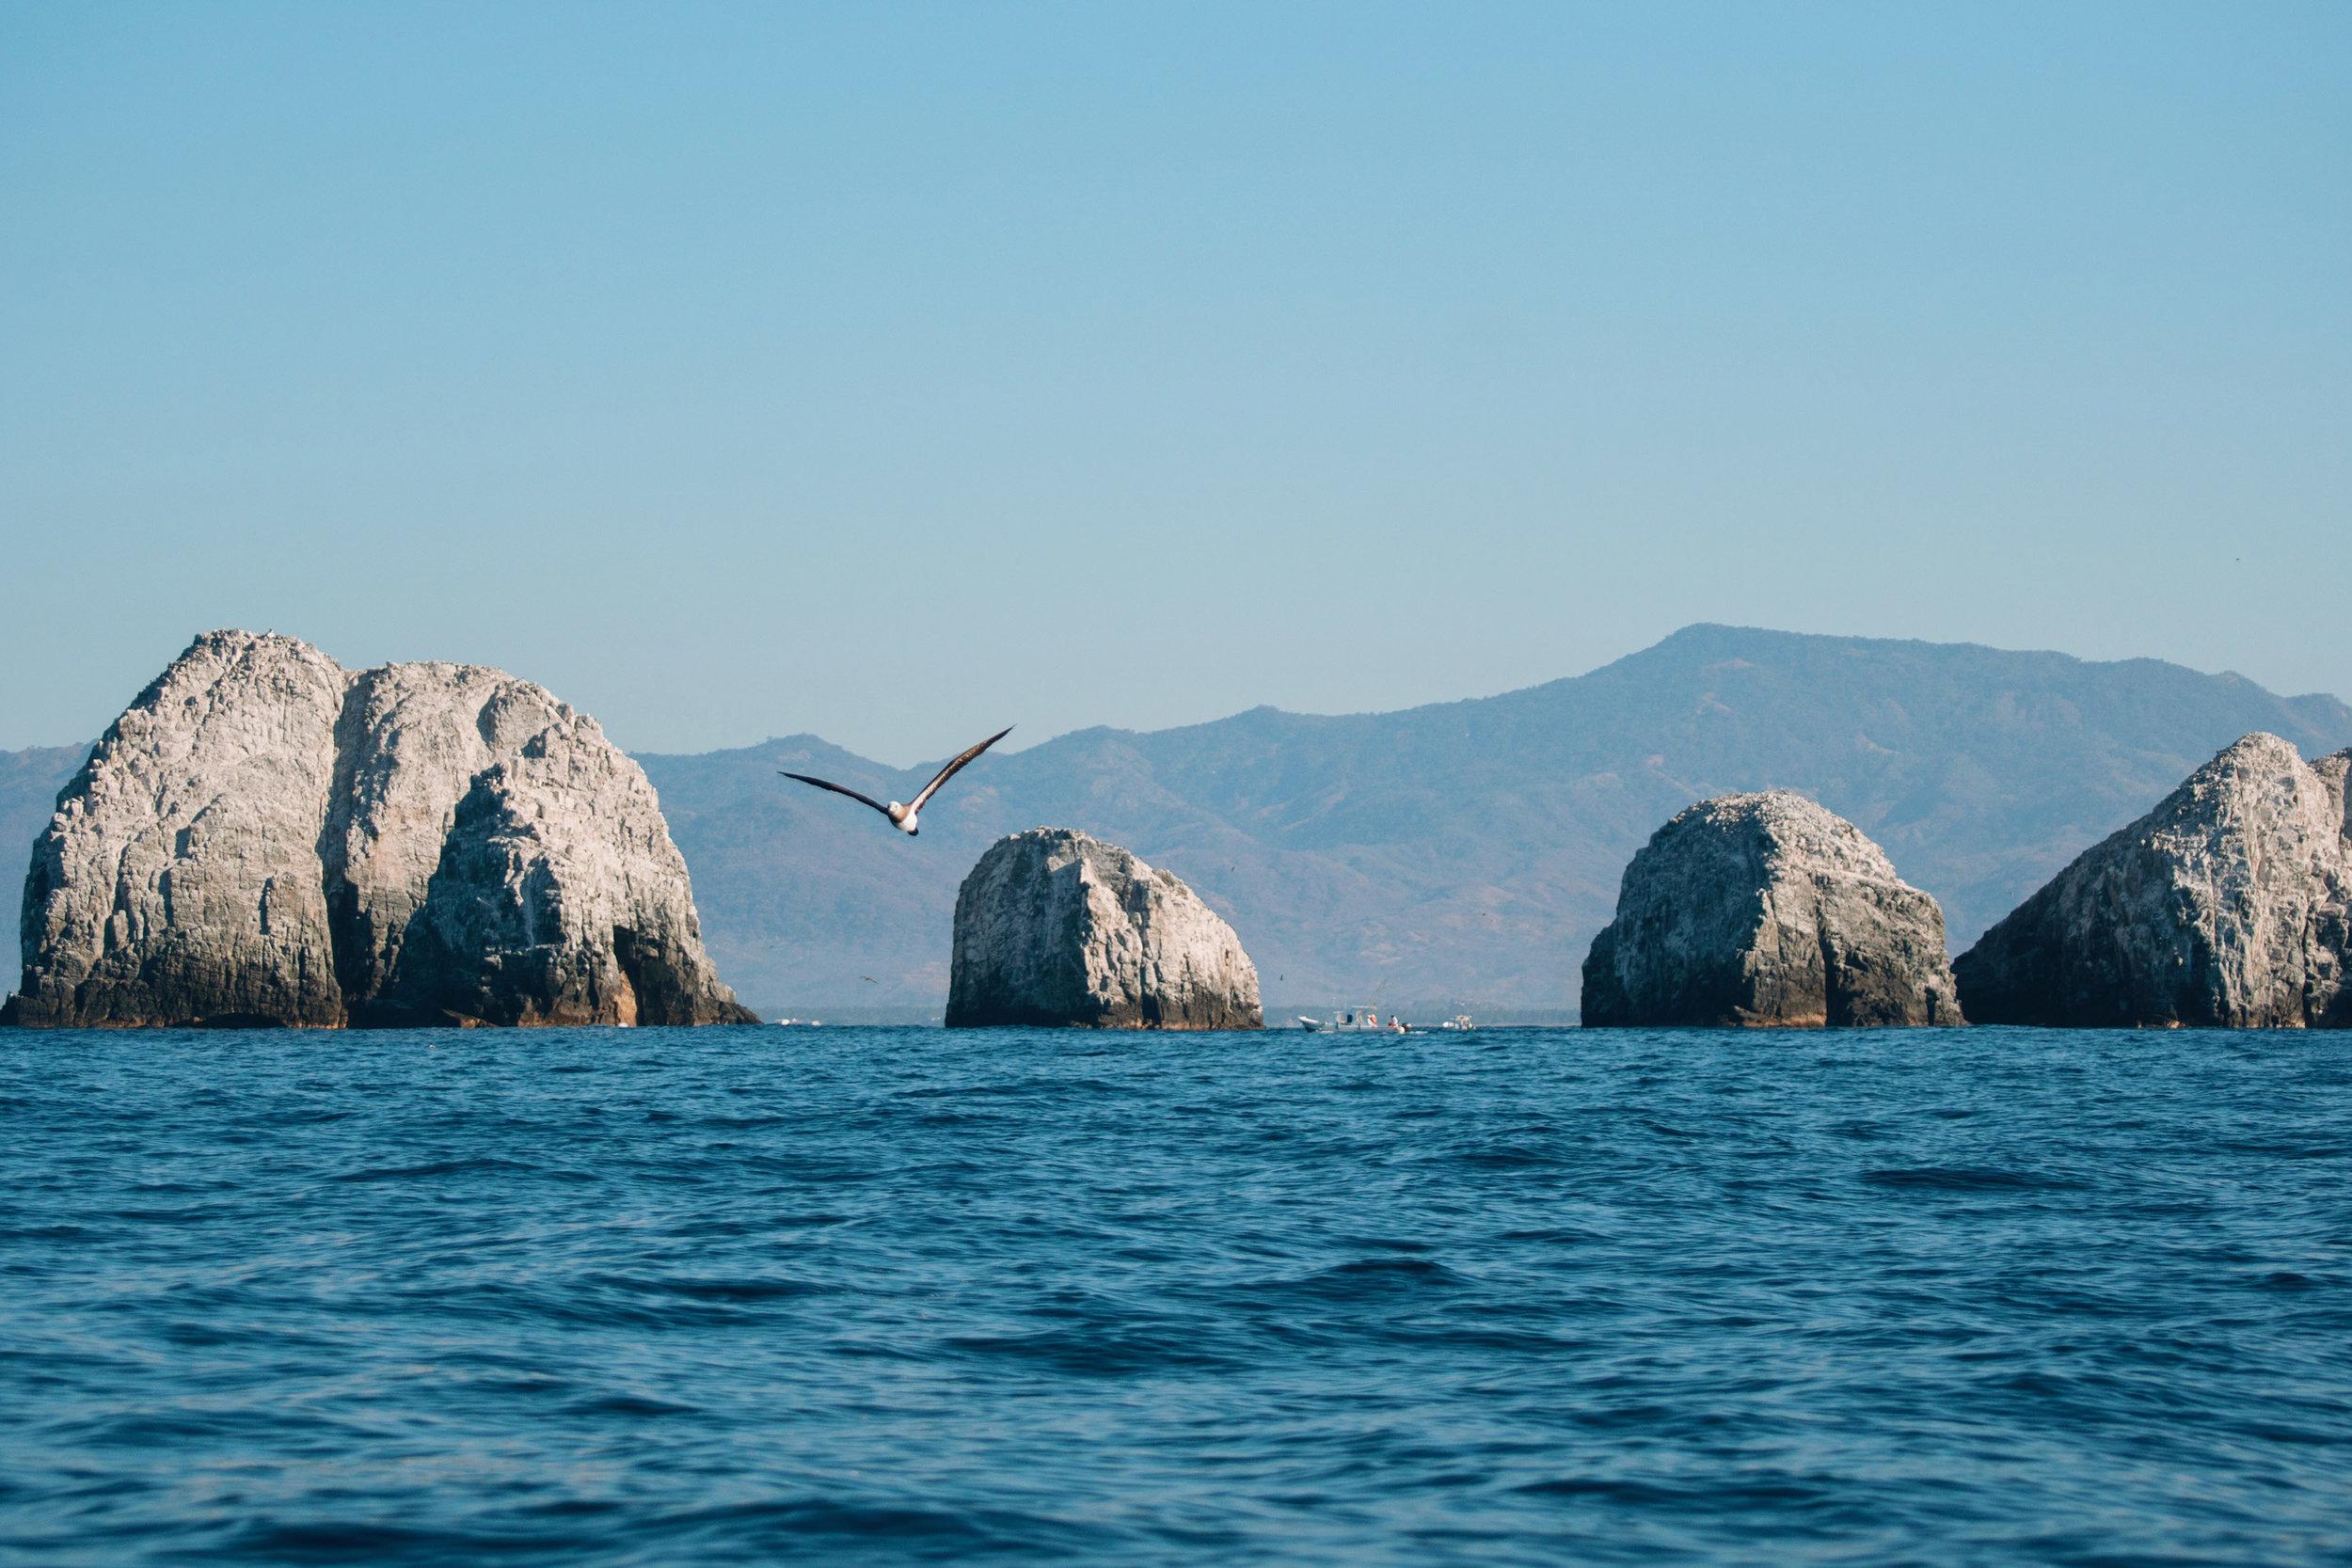 Ballenas-Ixtapa-Zihuatanejo-Fotografia-Heiko-Bothe-18.JPG